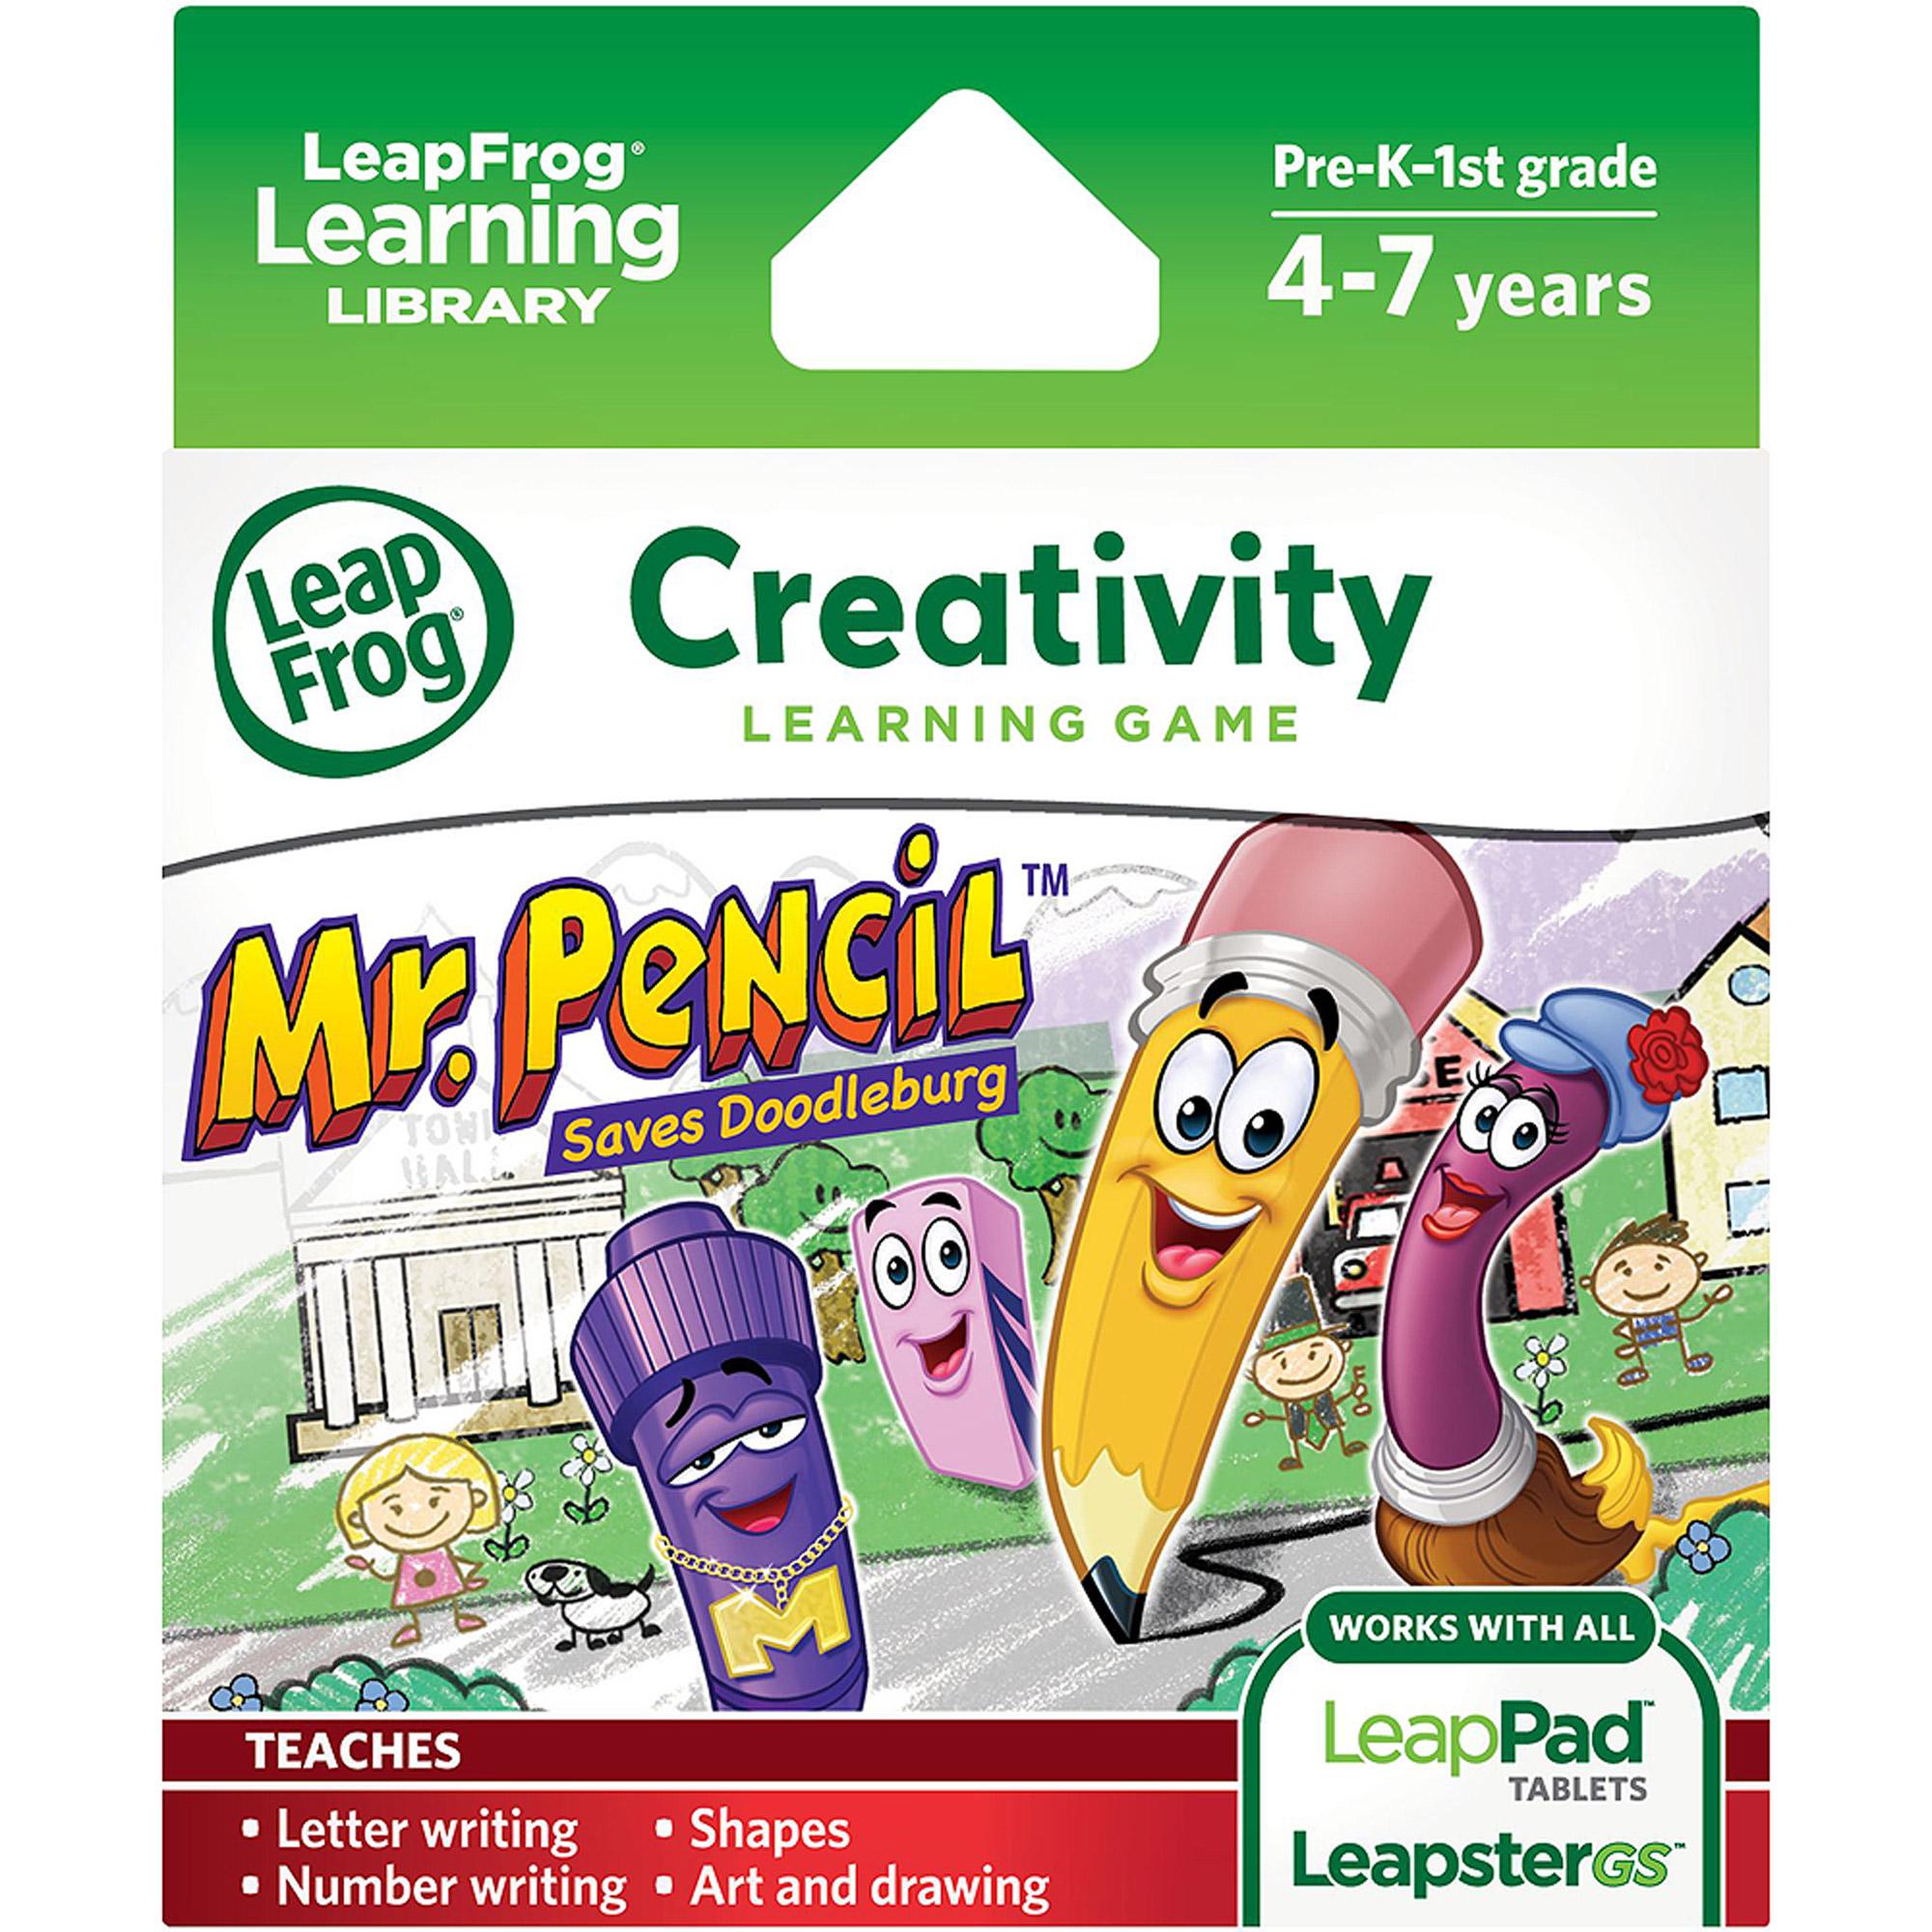 LeapFrog Explorer & LeapPad Learning Game: Mr. Pencil Saves Doodleburg